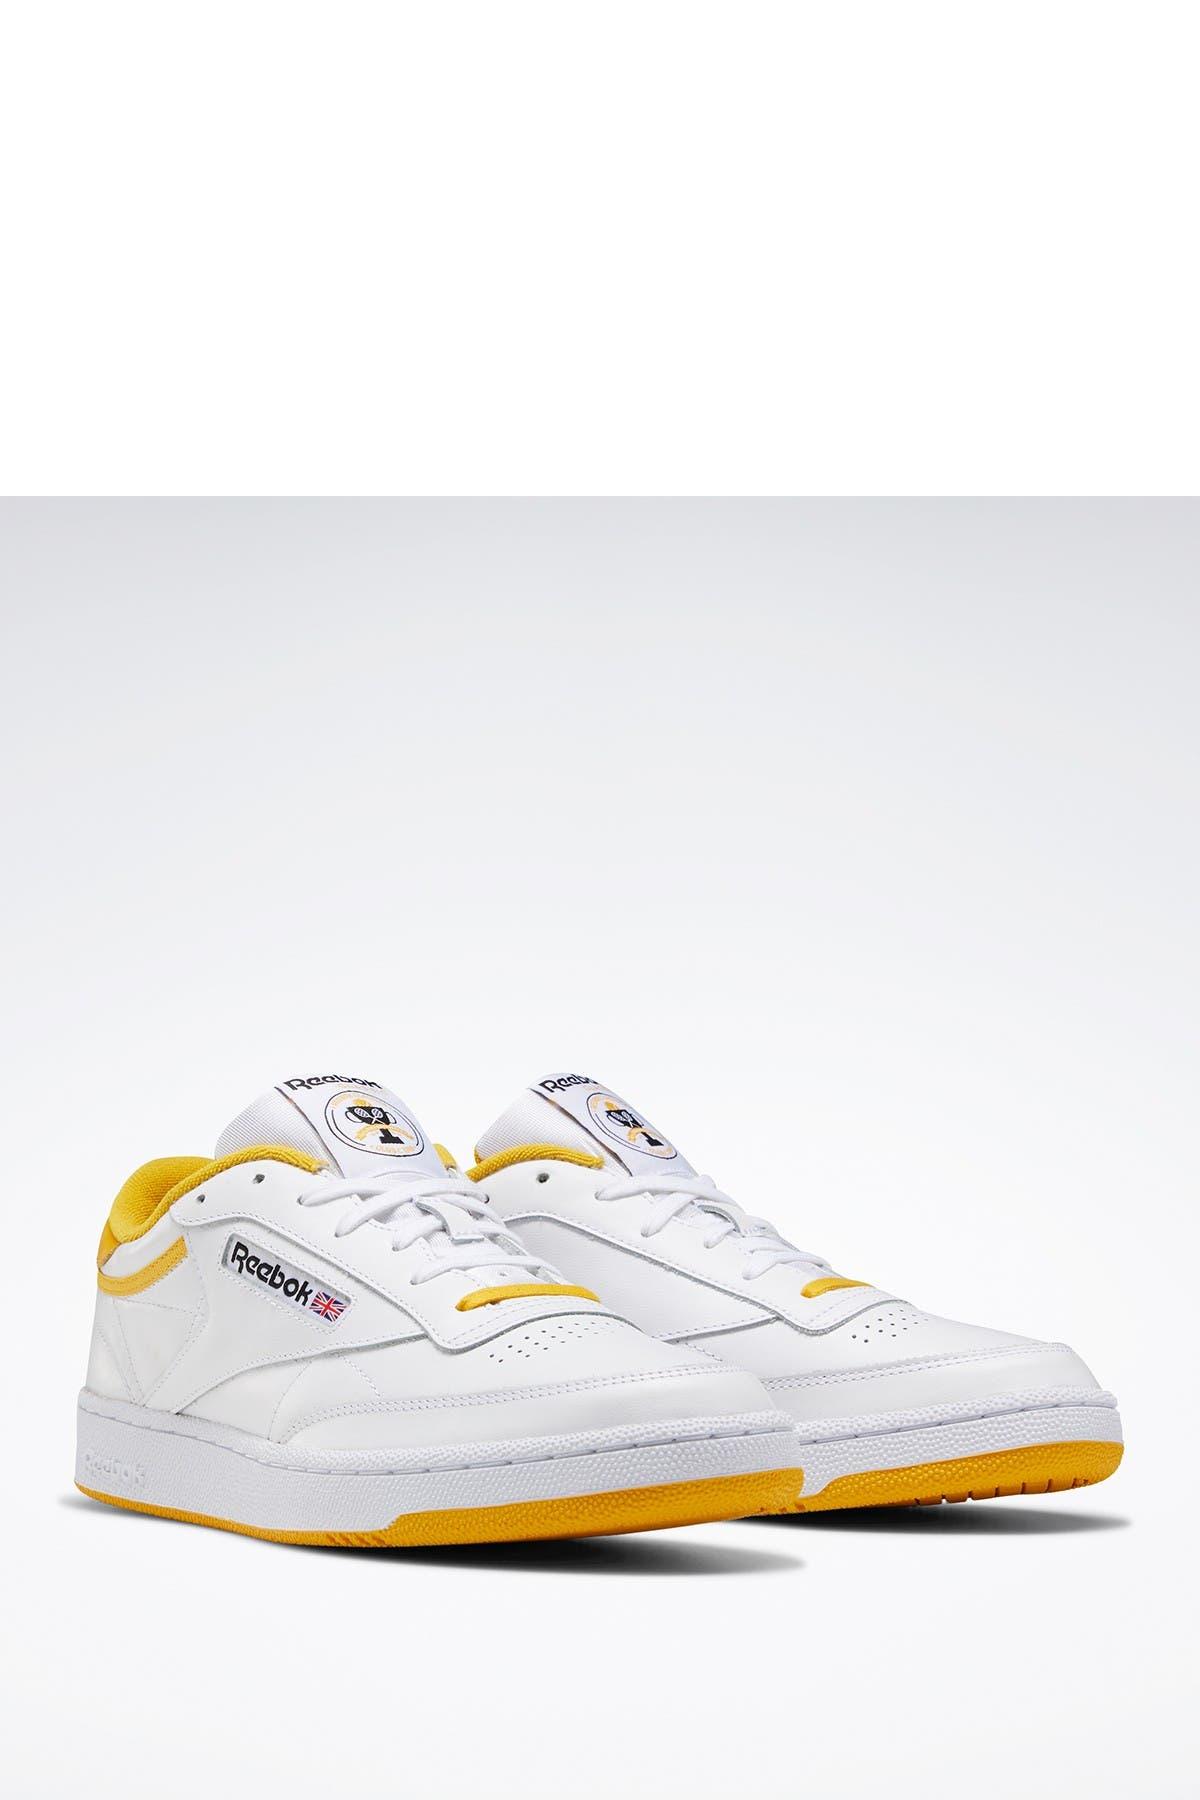 Image of Reebok Club Classic 85 Sneaker